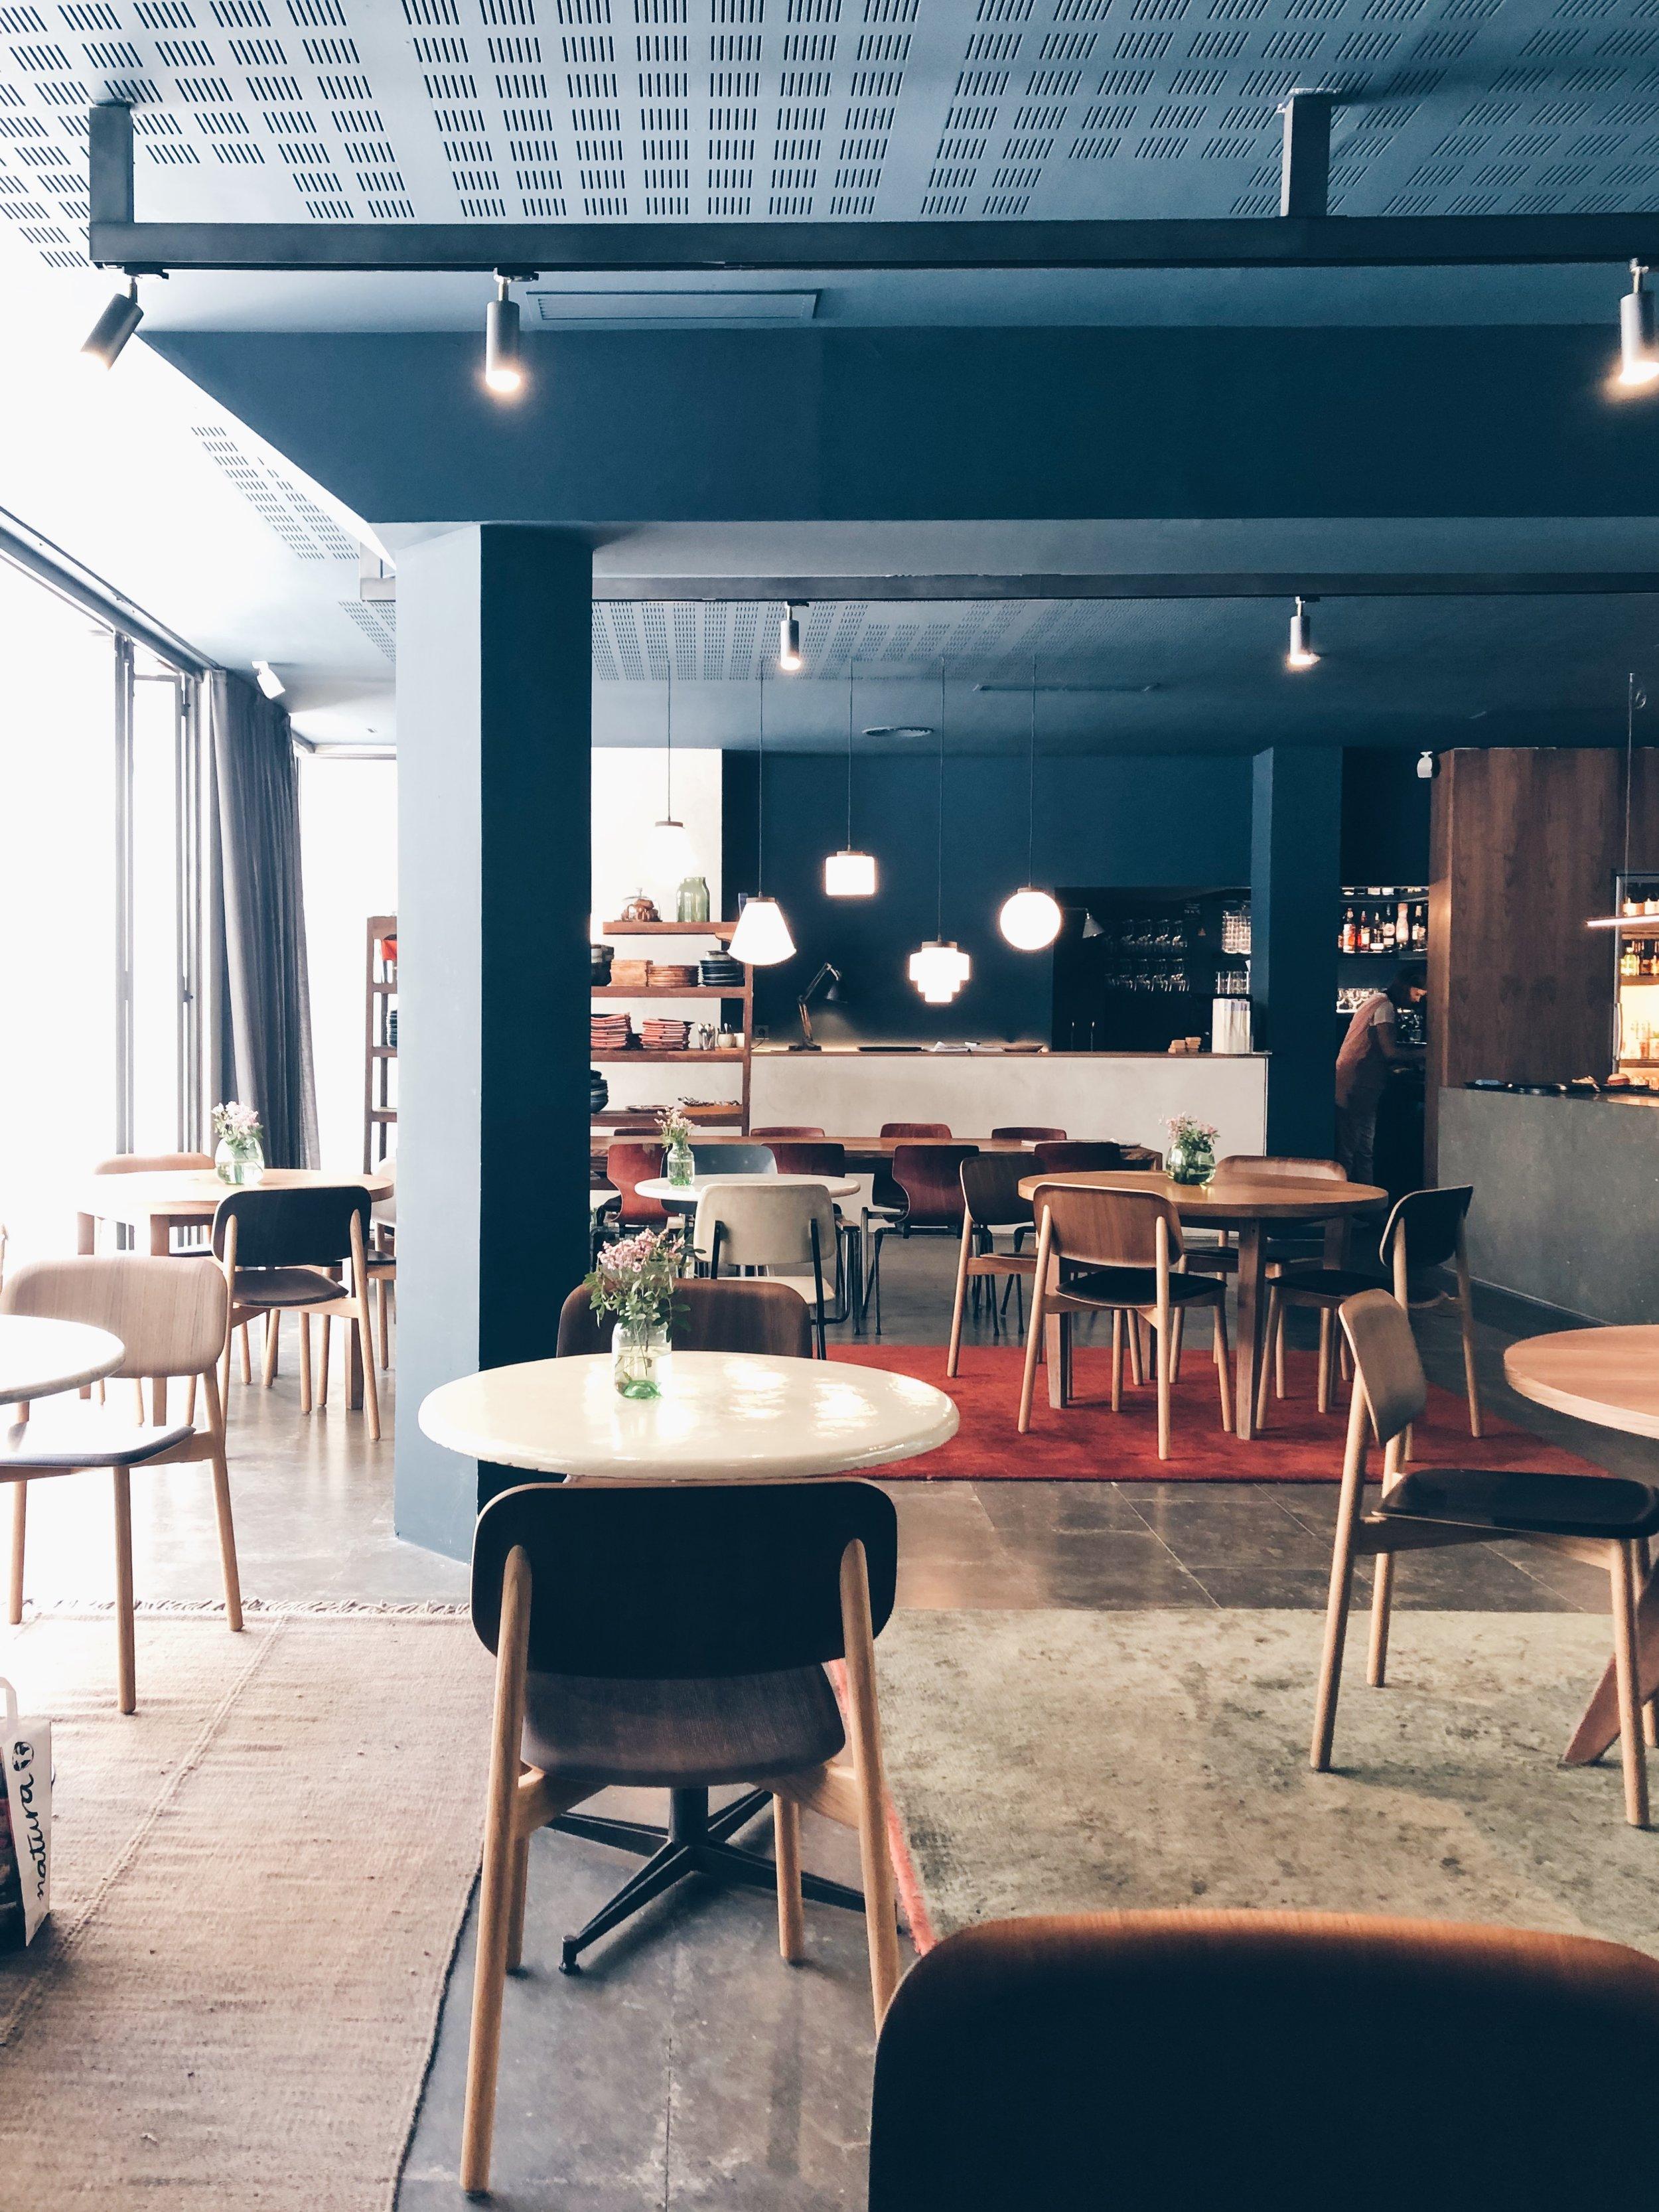 Les Filles Cafe, Barcelona. Photo © Barcelona Food Experience.